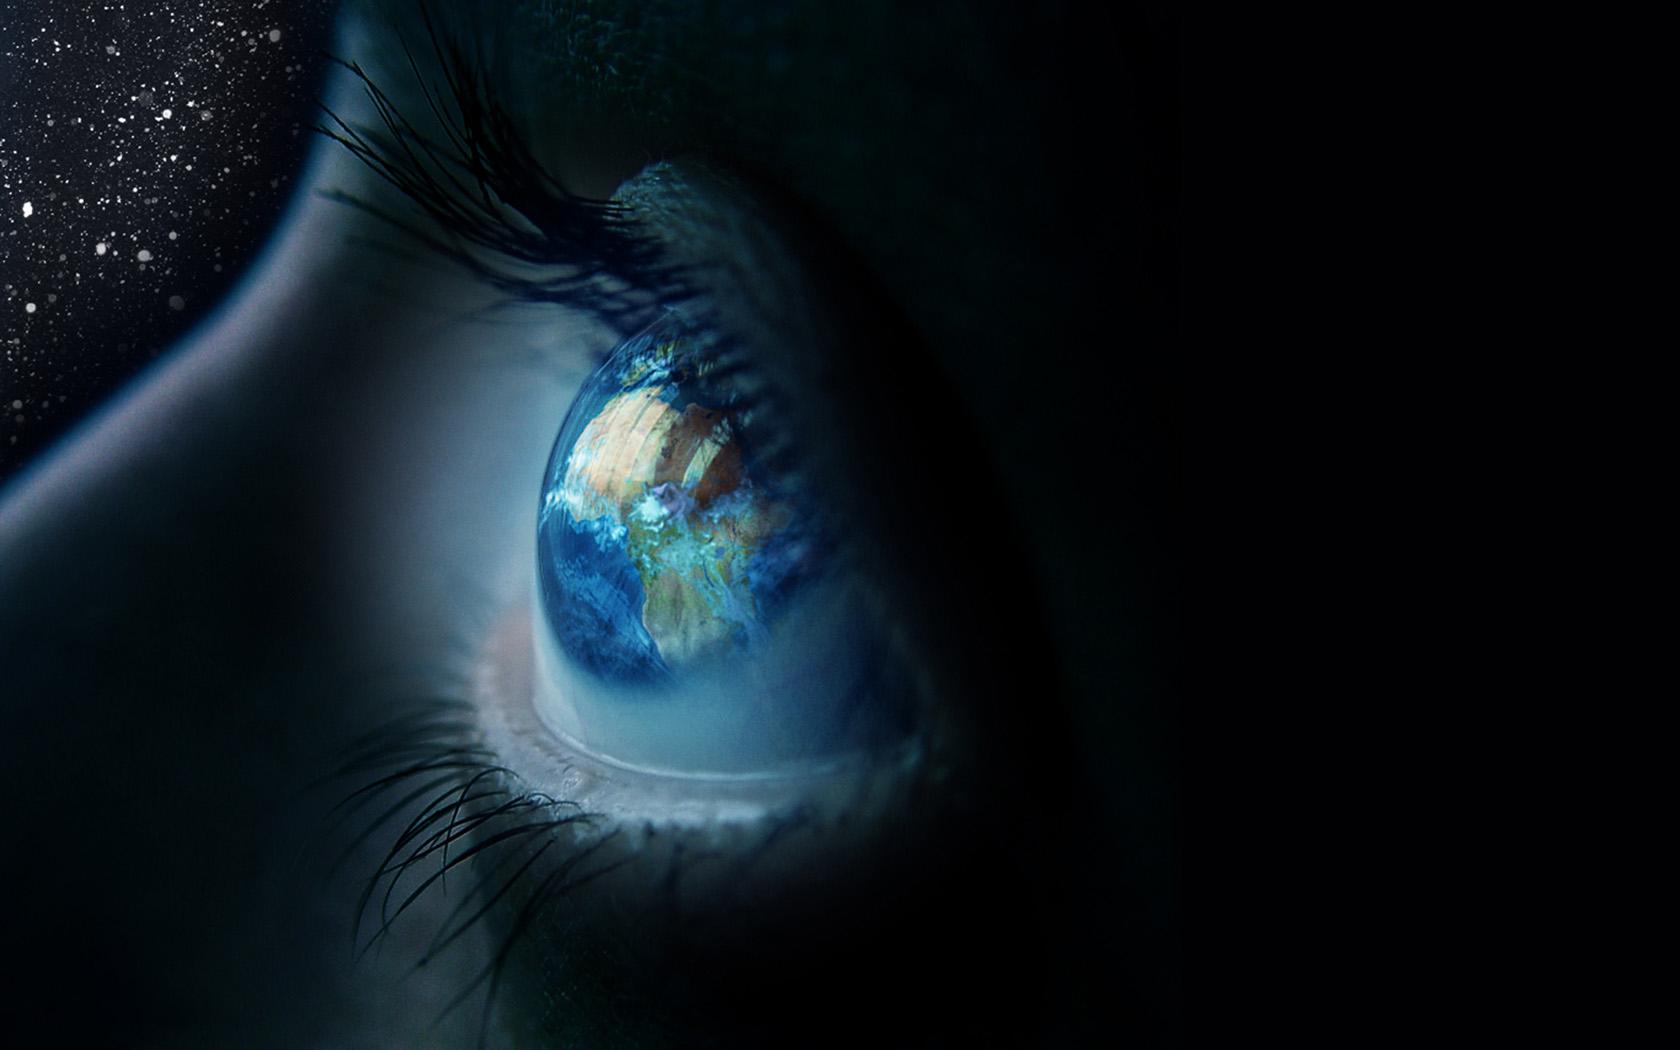 Desktop backrounds Eye_of10